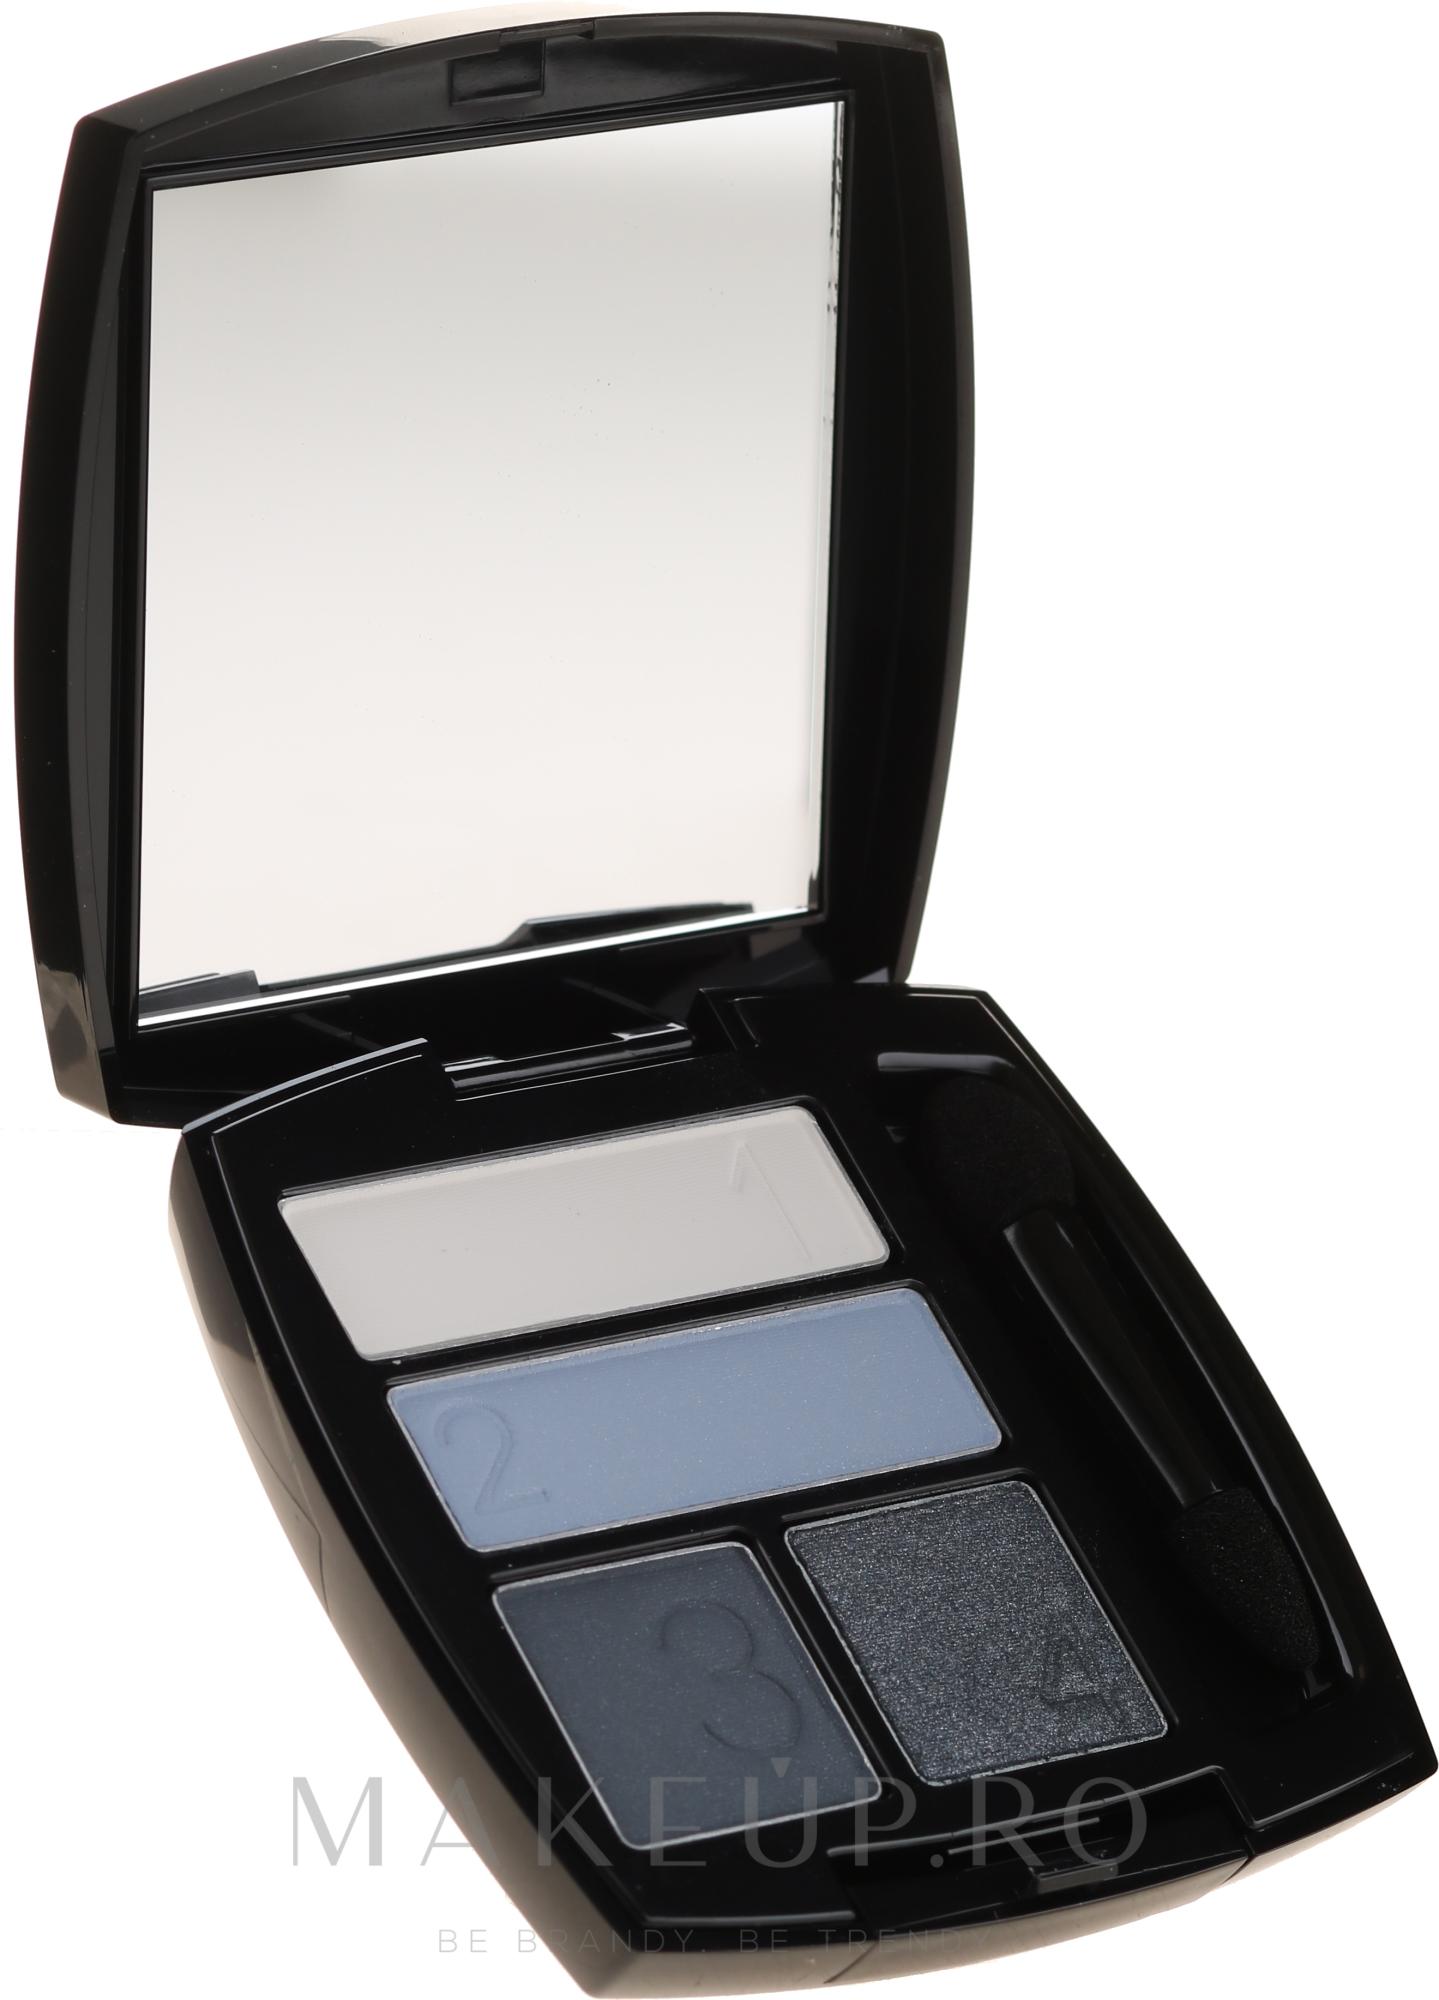 Fard de ochi - Avon True Color Eyeshadow Quad — Imagine Smoldering Blues